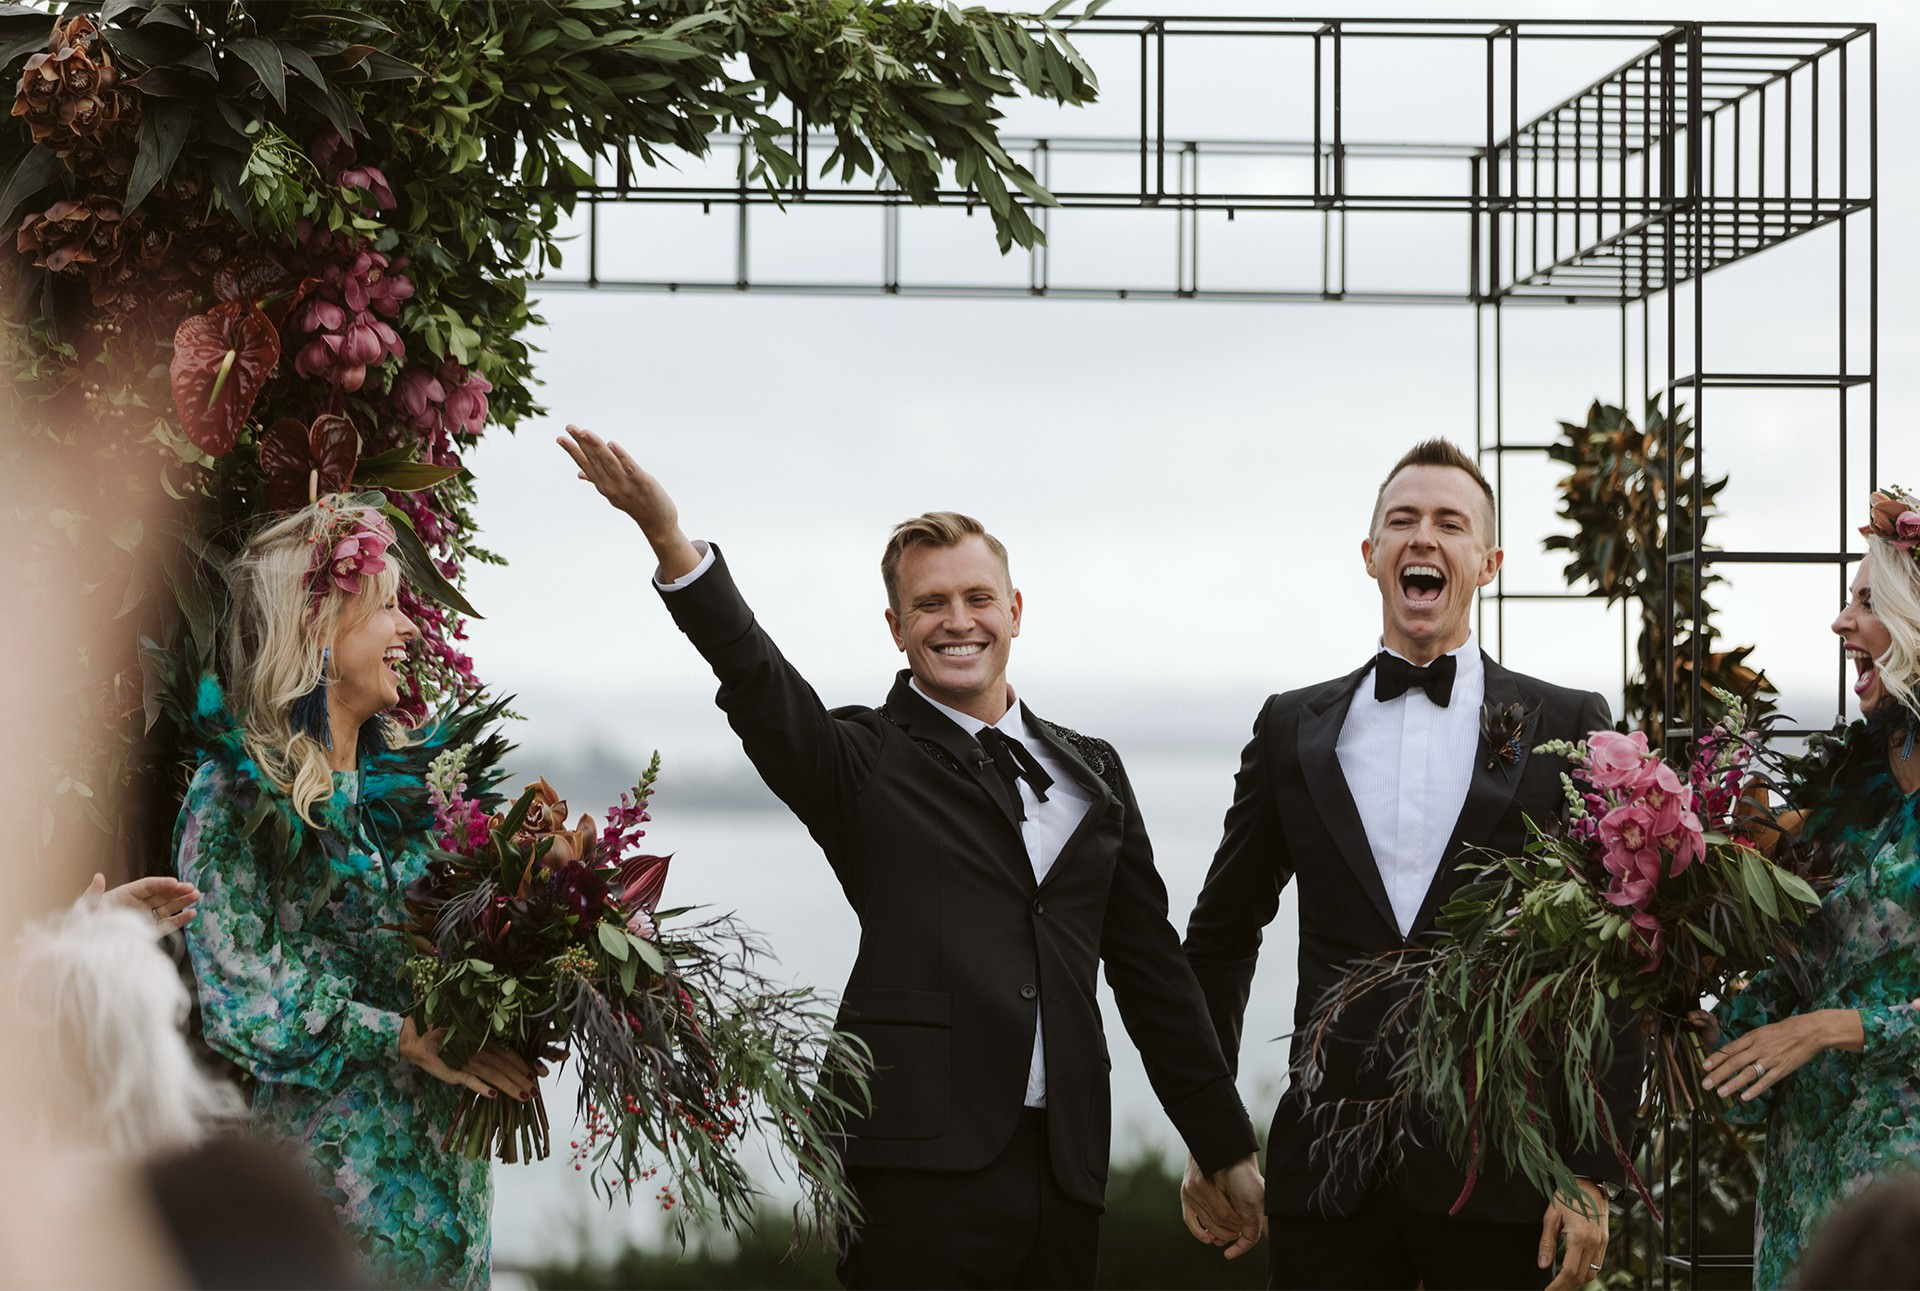 PETE-+-ANTE---Wedding-Floral_0003s_0000_PETE-+-ANTE-6.jpg